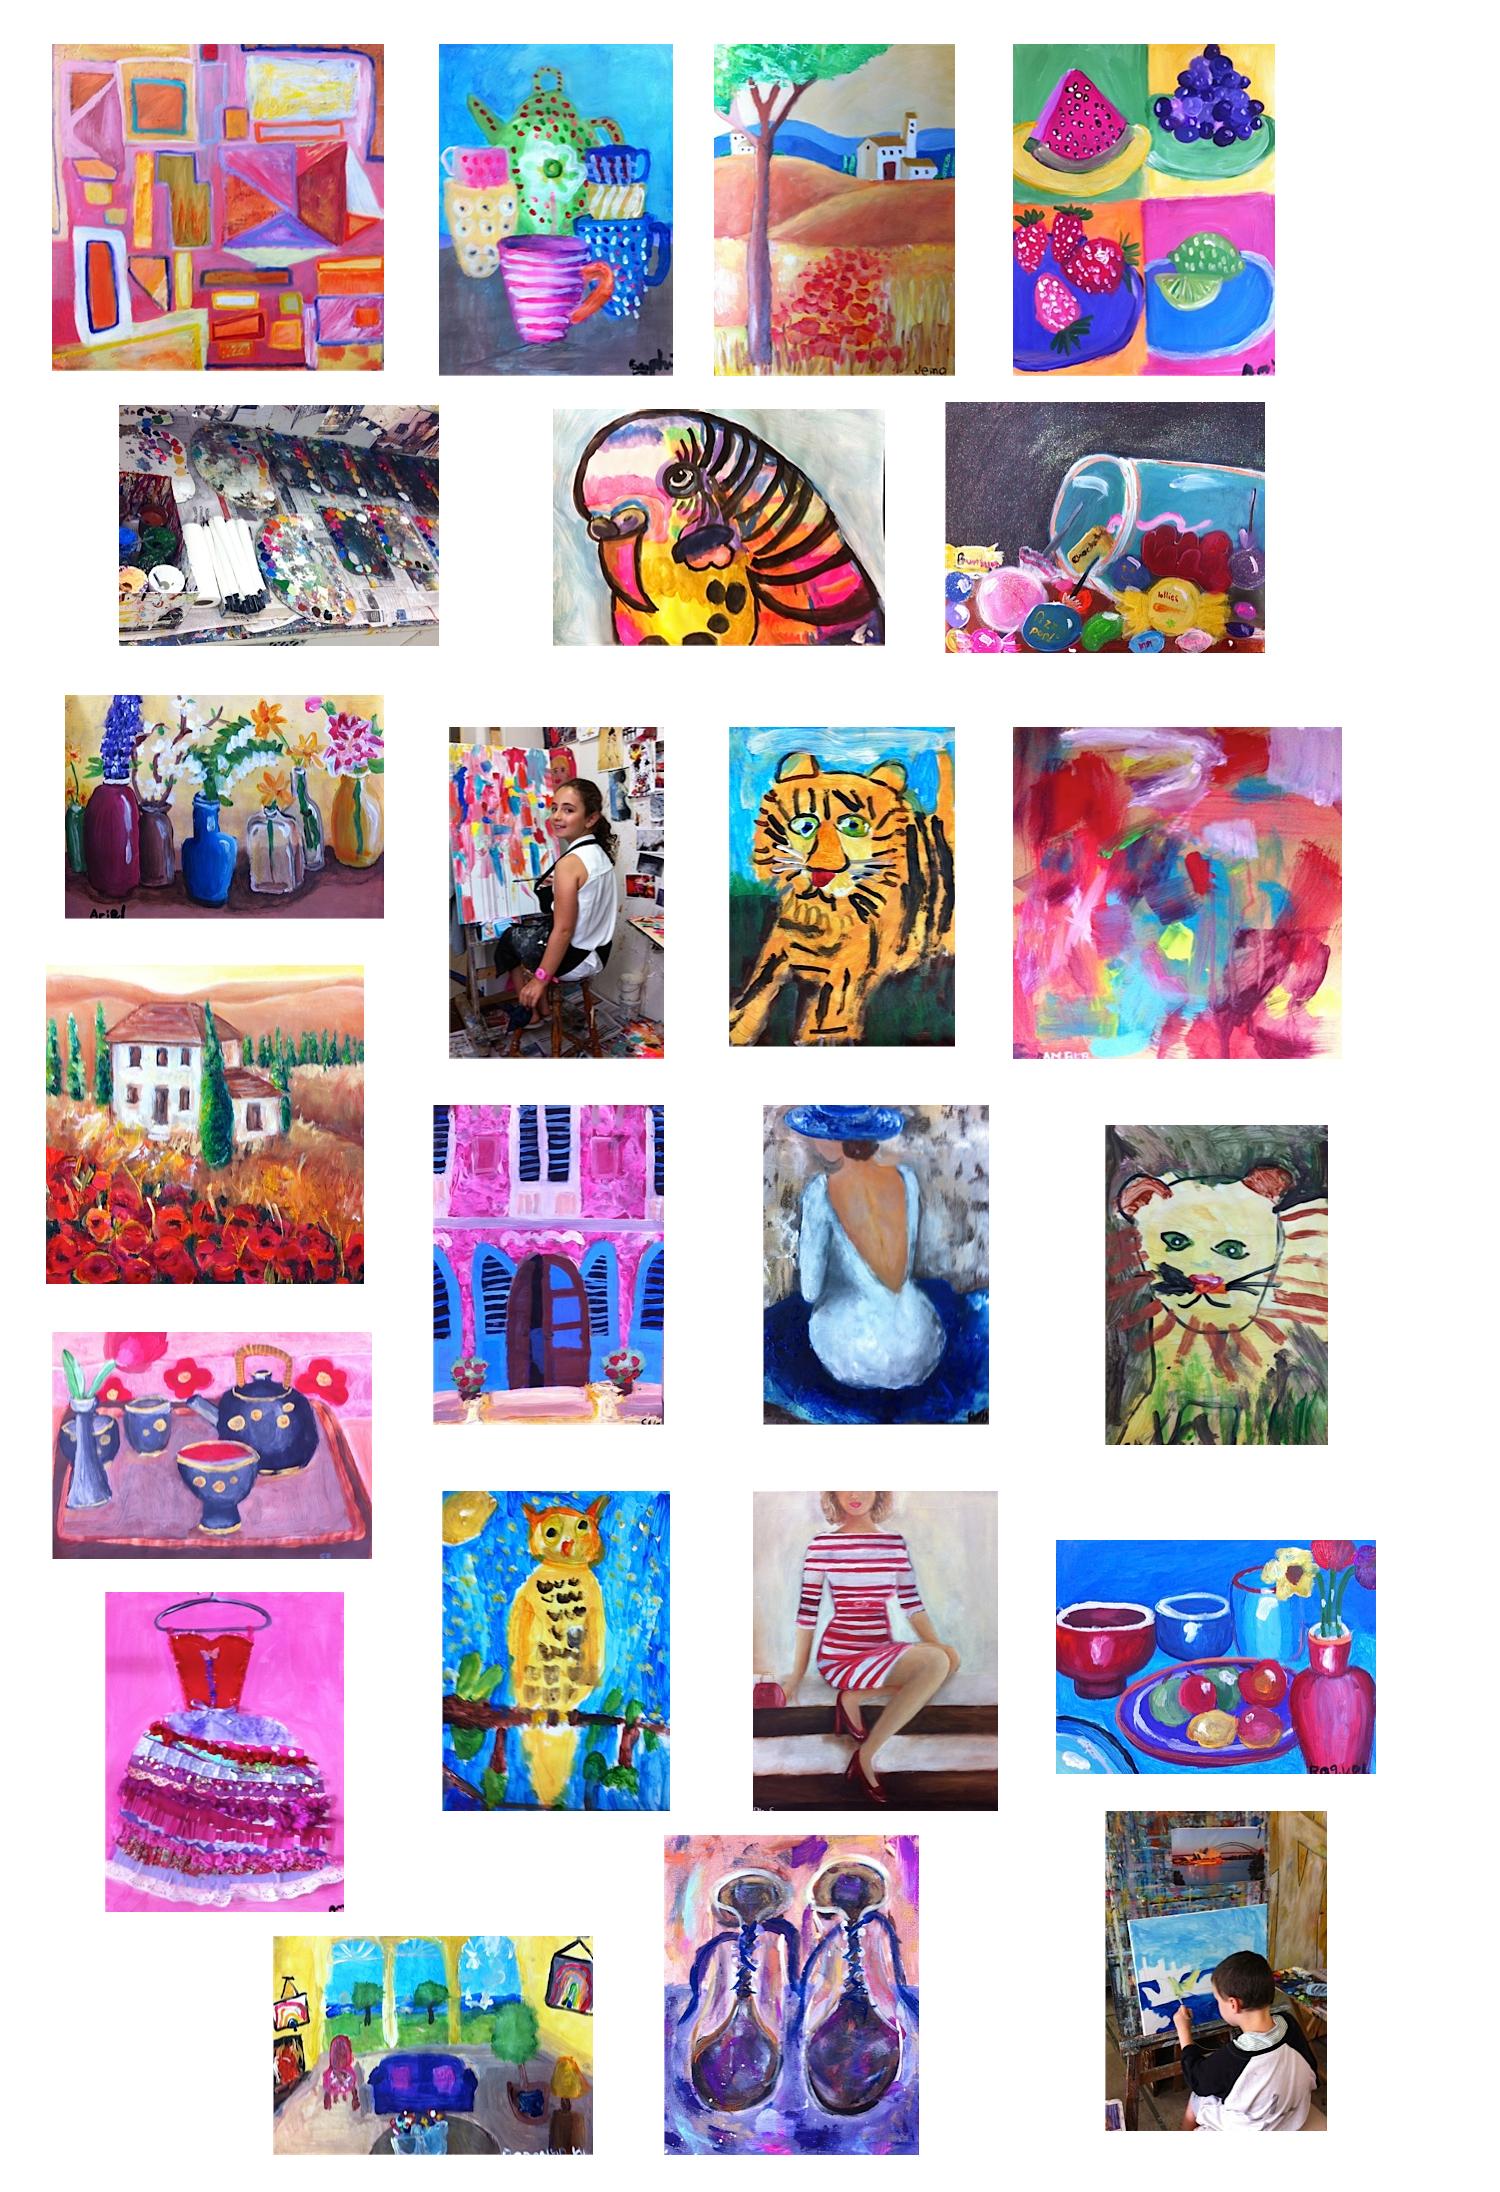 Kids art page.jpg